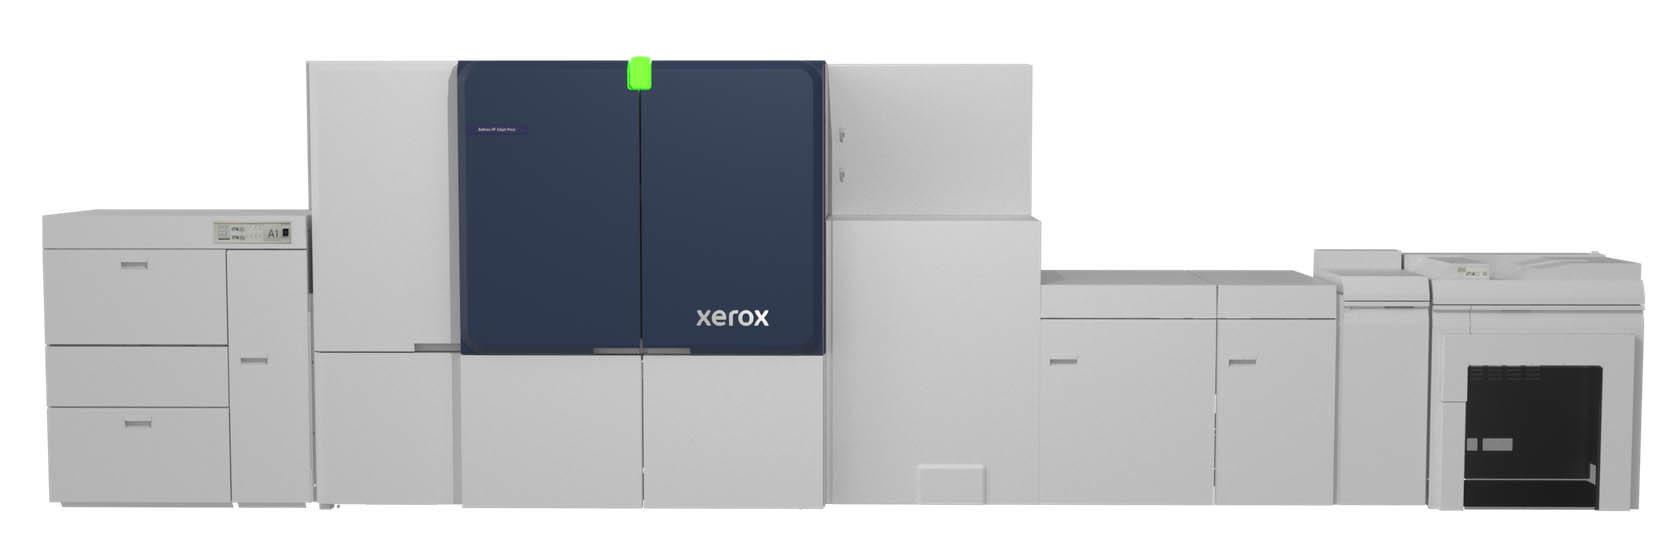 Xerox Baltoro production printer